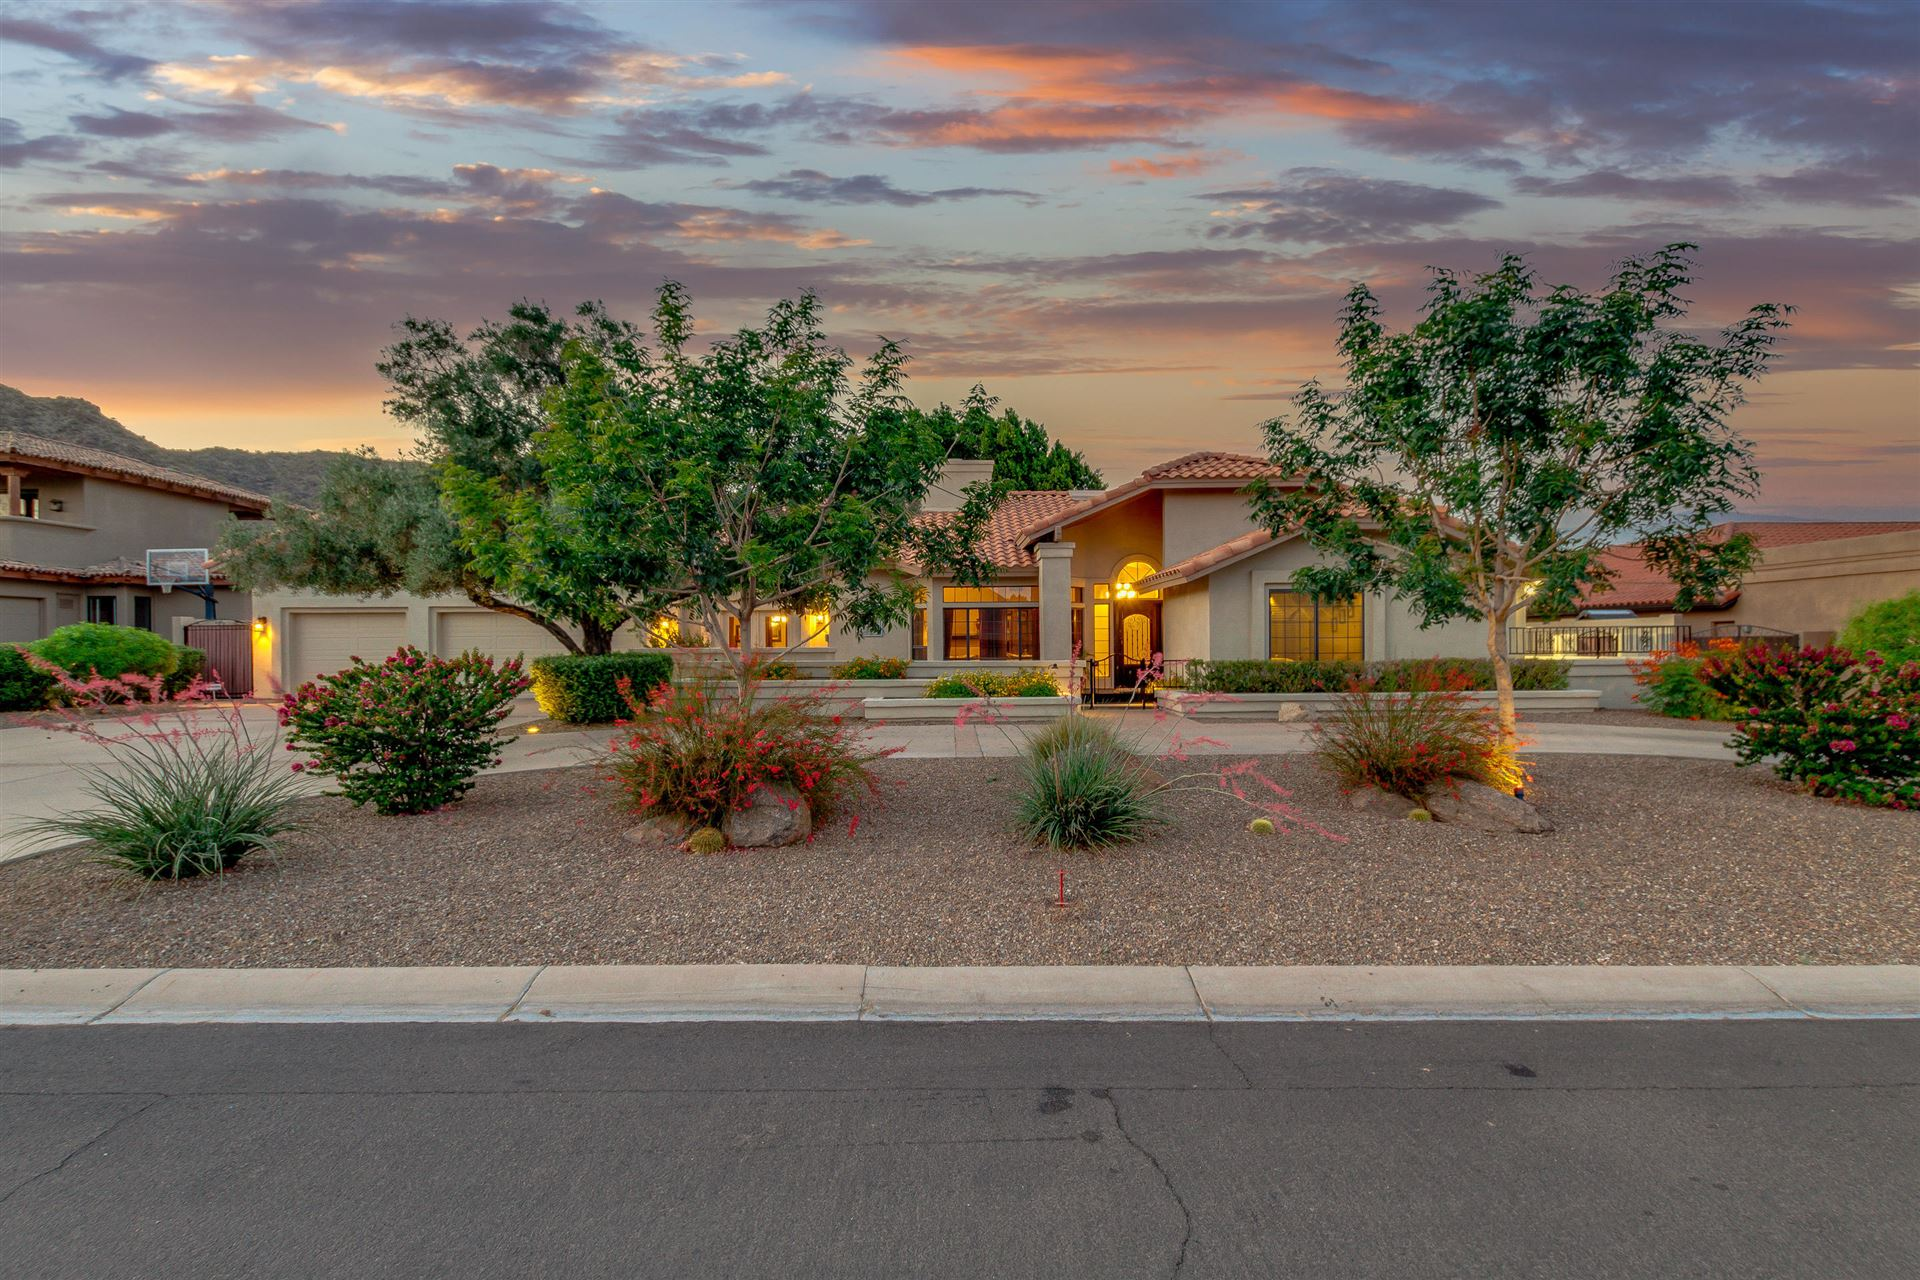 Photo of 3538 E KACHINA Drive, Phoenix, AZ 85044 (MLS # 6230581)